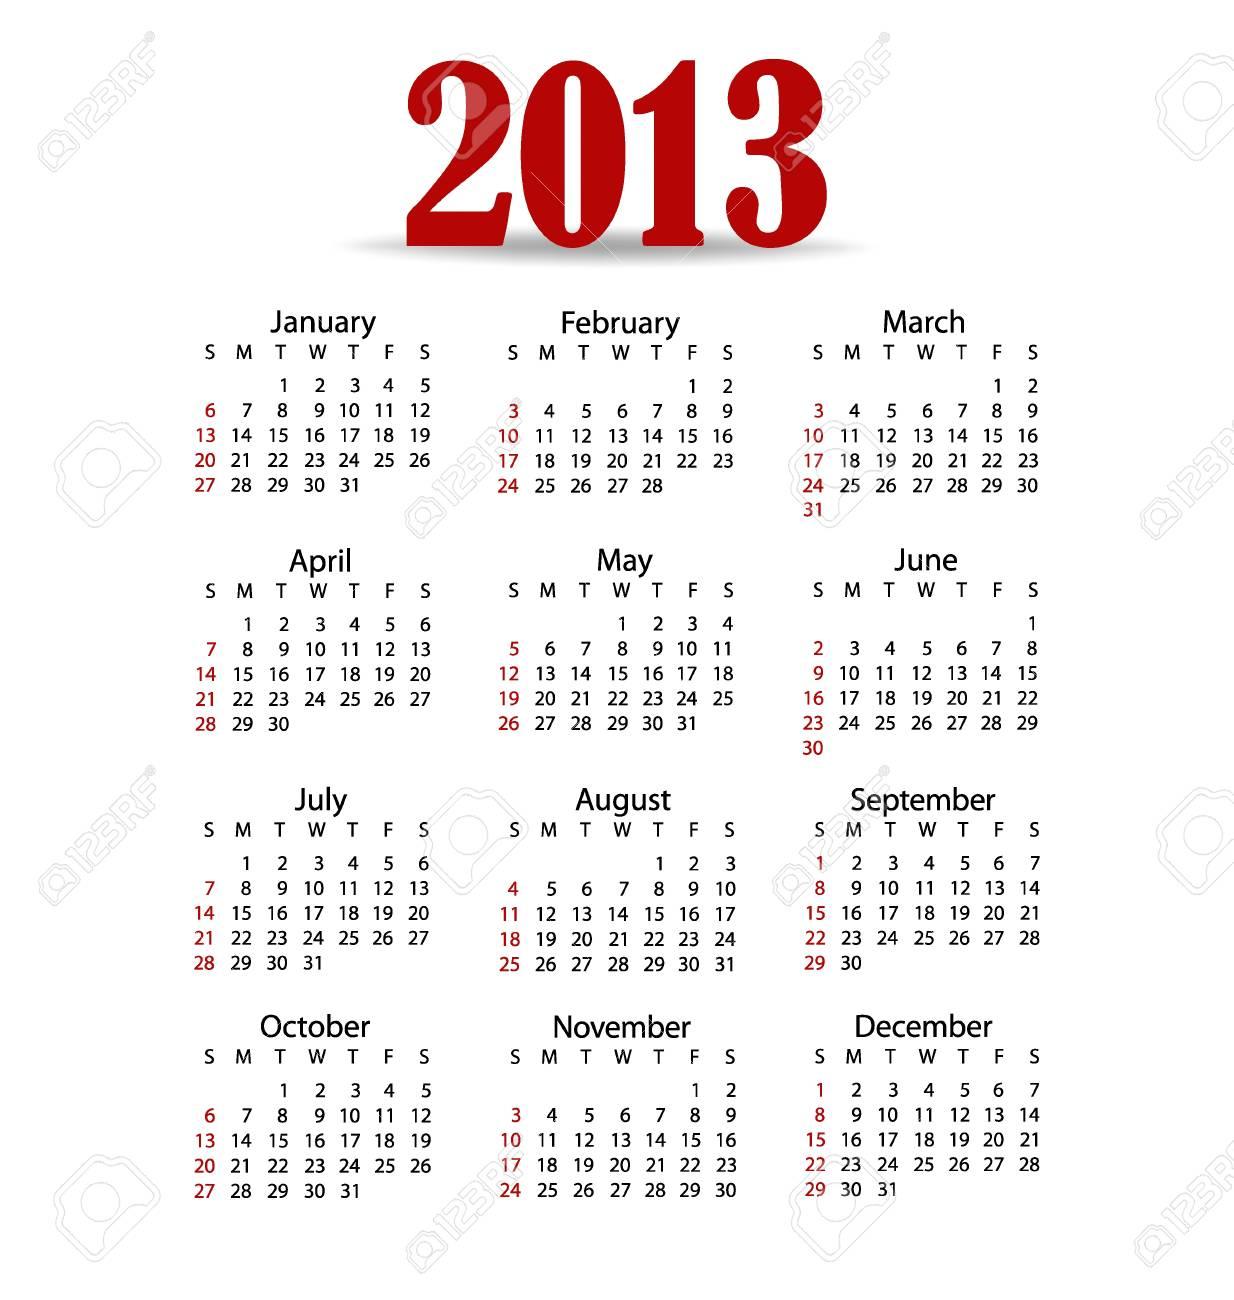 Simple 2013 year calendar, vector illustration. Stock Vector - 16991649